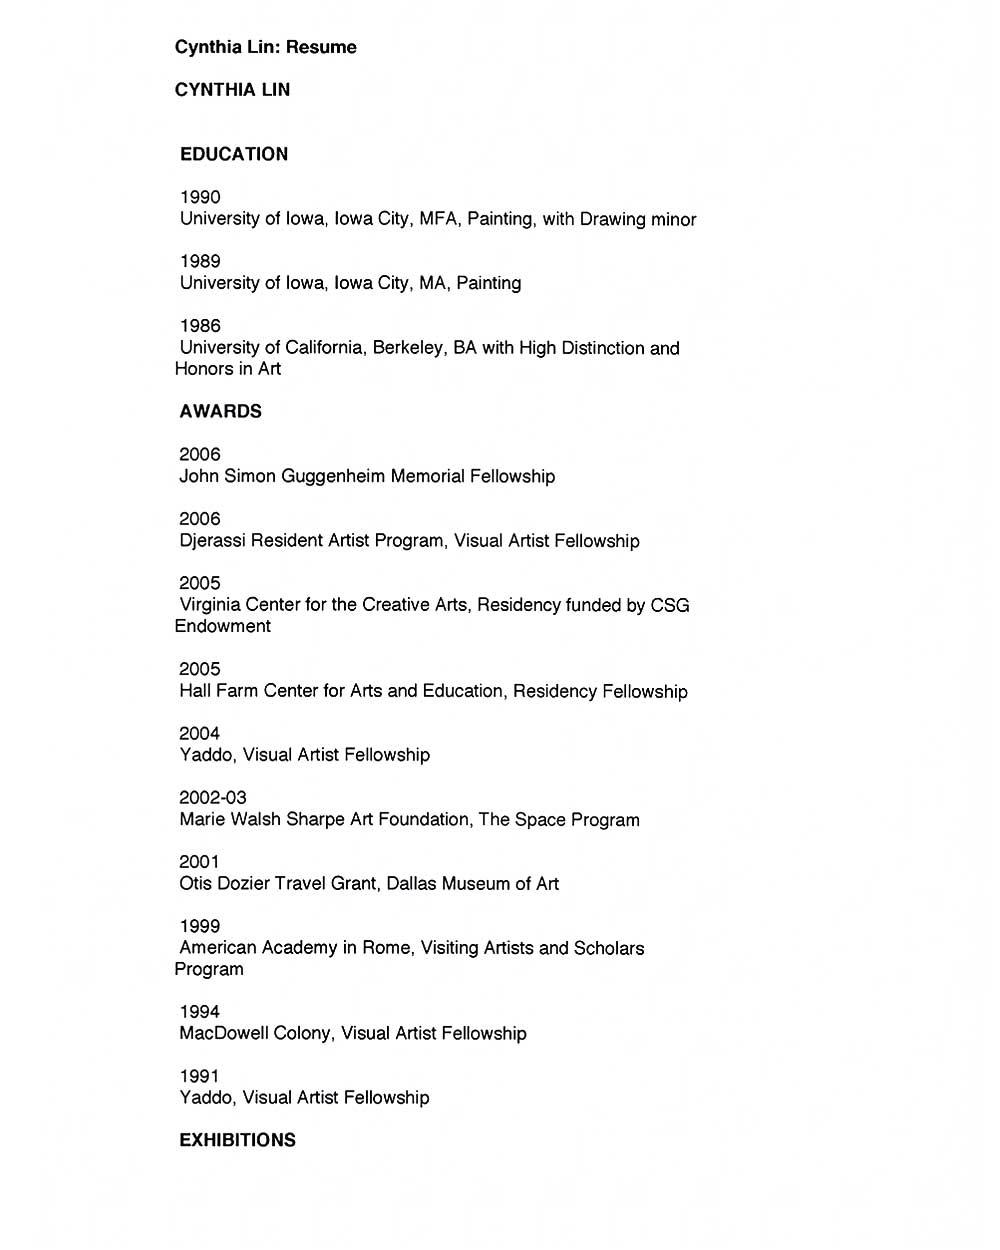 Cynthia Lin's Resume, pg 1